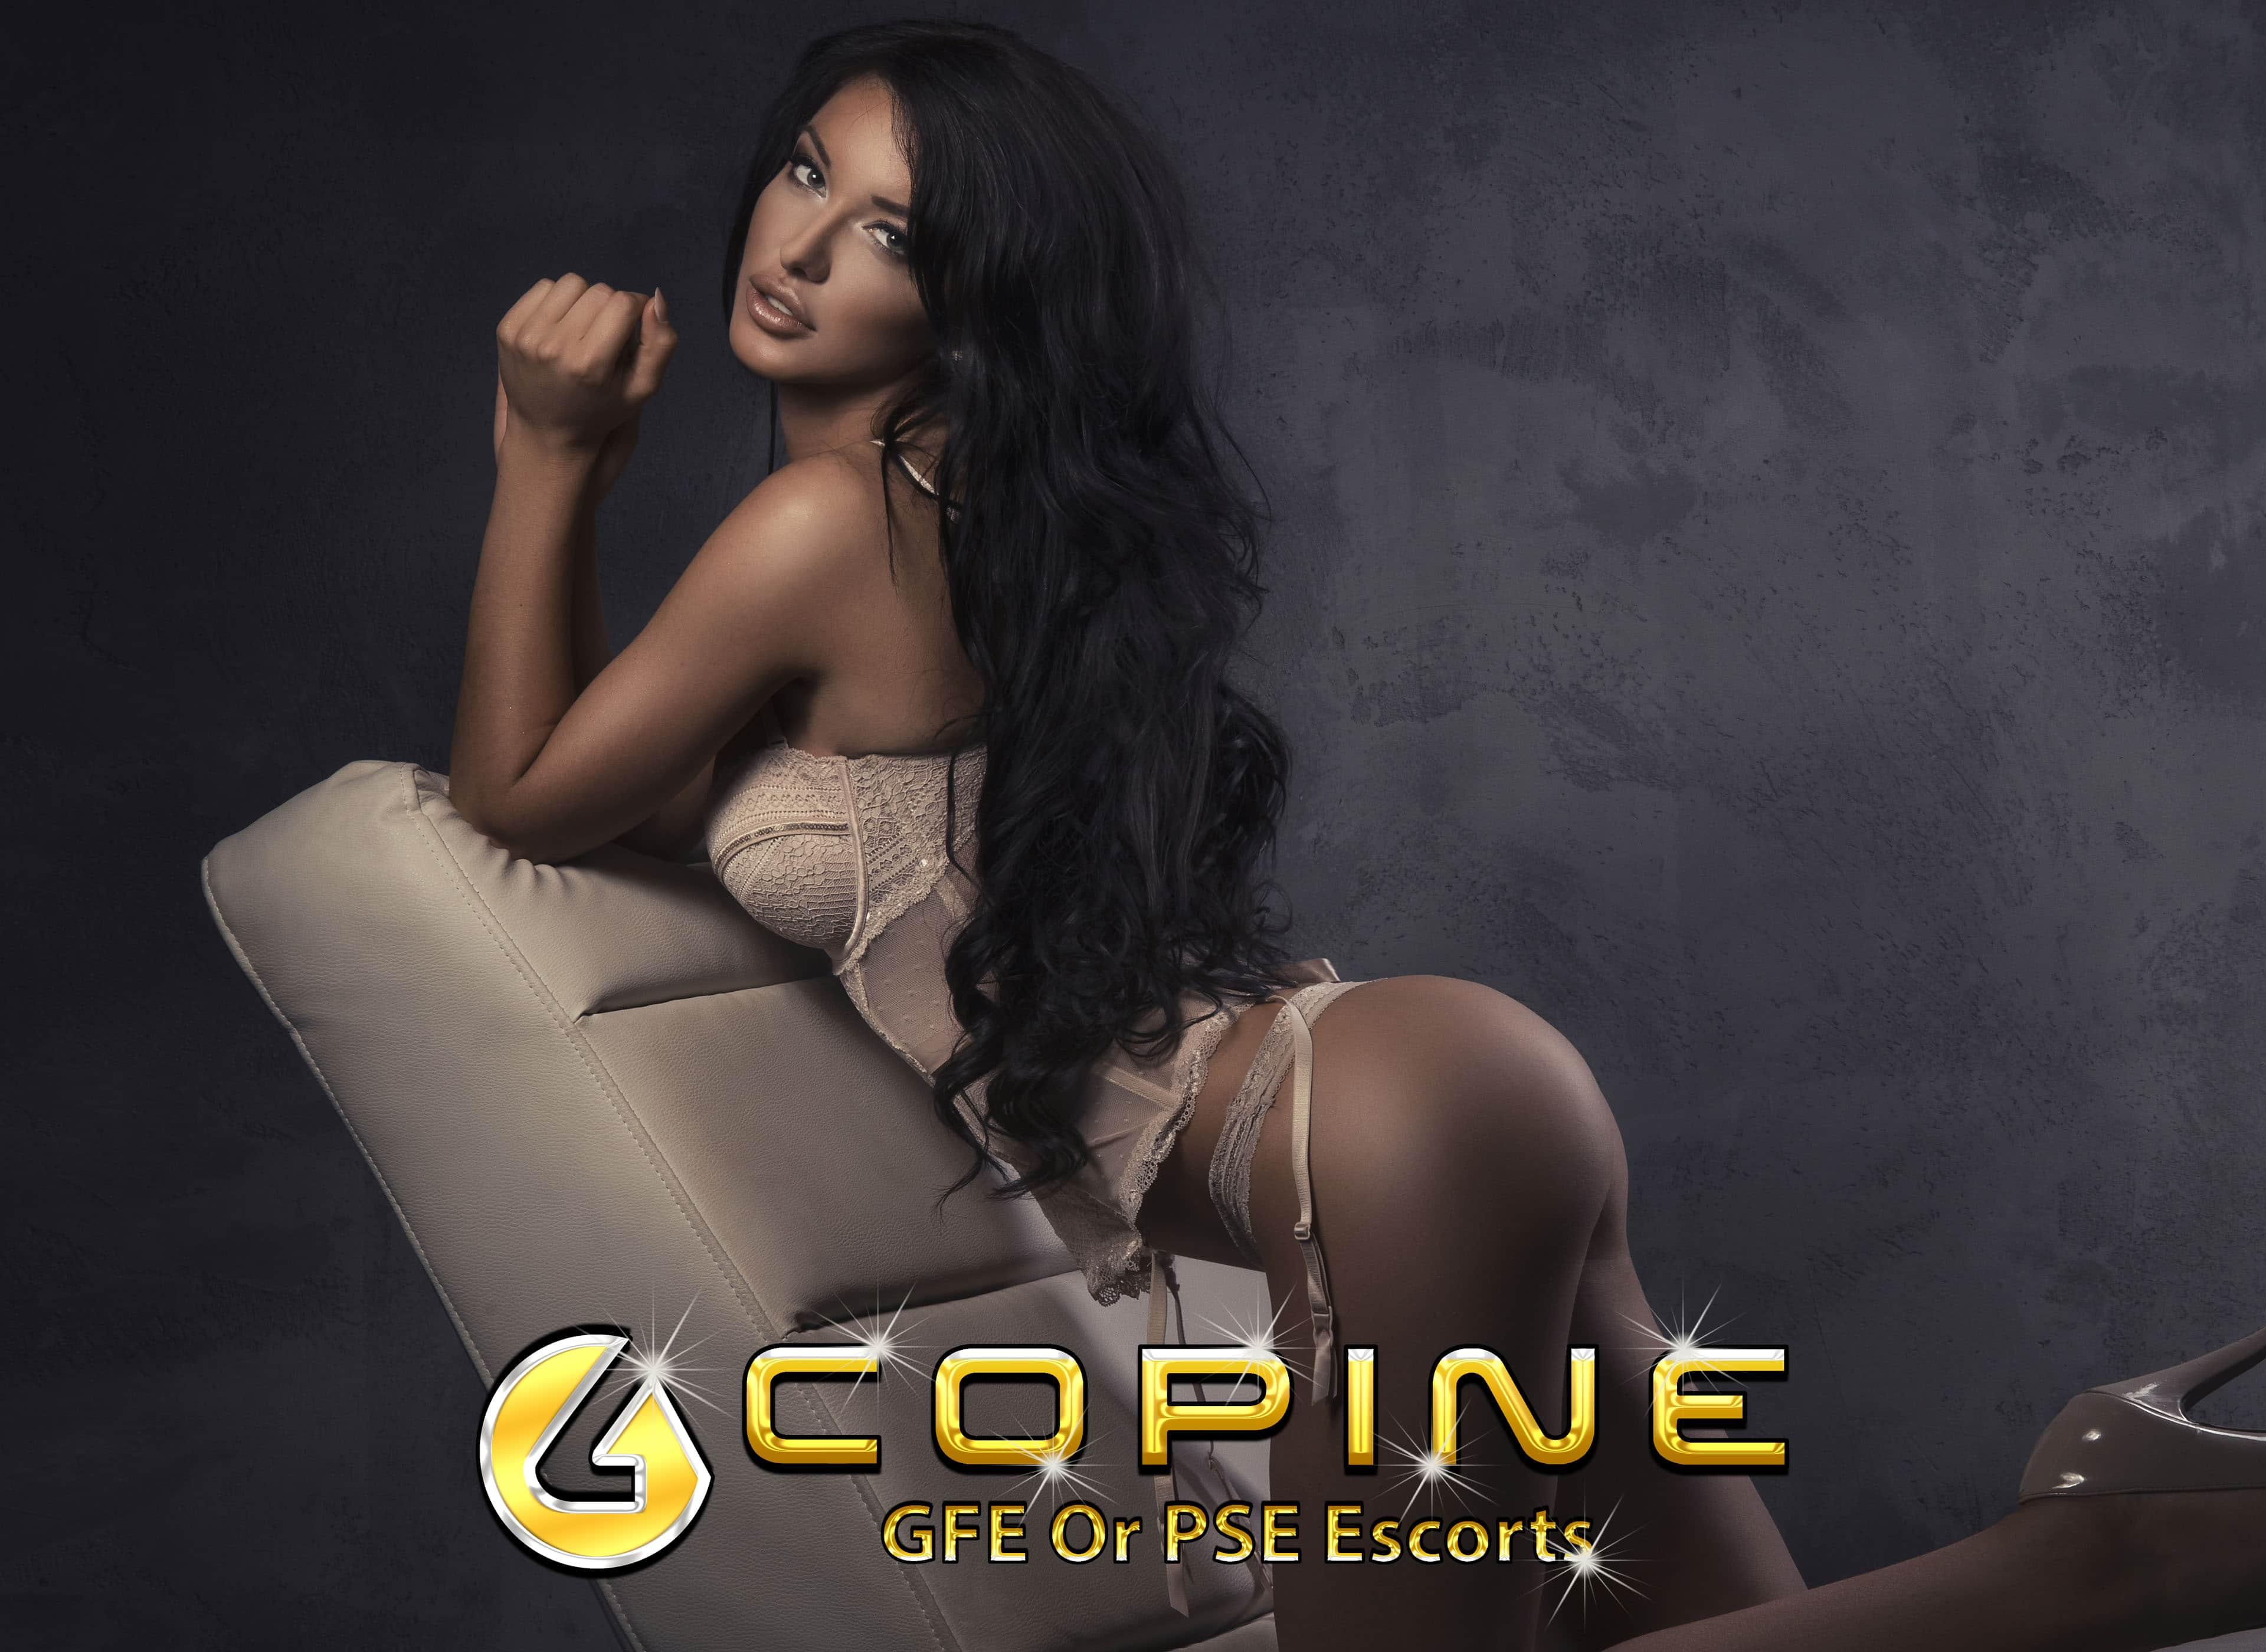 Absolu-Copine-Division-Escort-GirlFriend-Experience-GFE-PSE-VIP-Elite-EN-4K